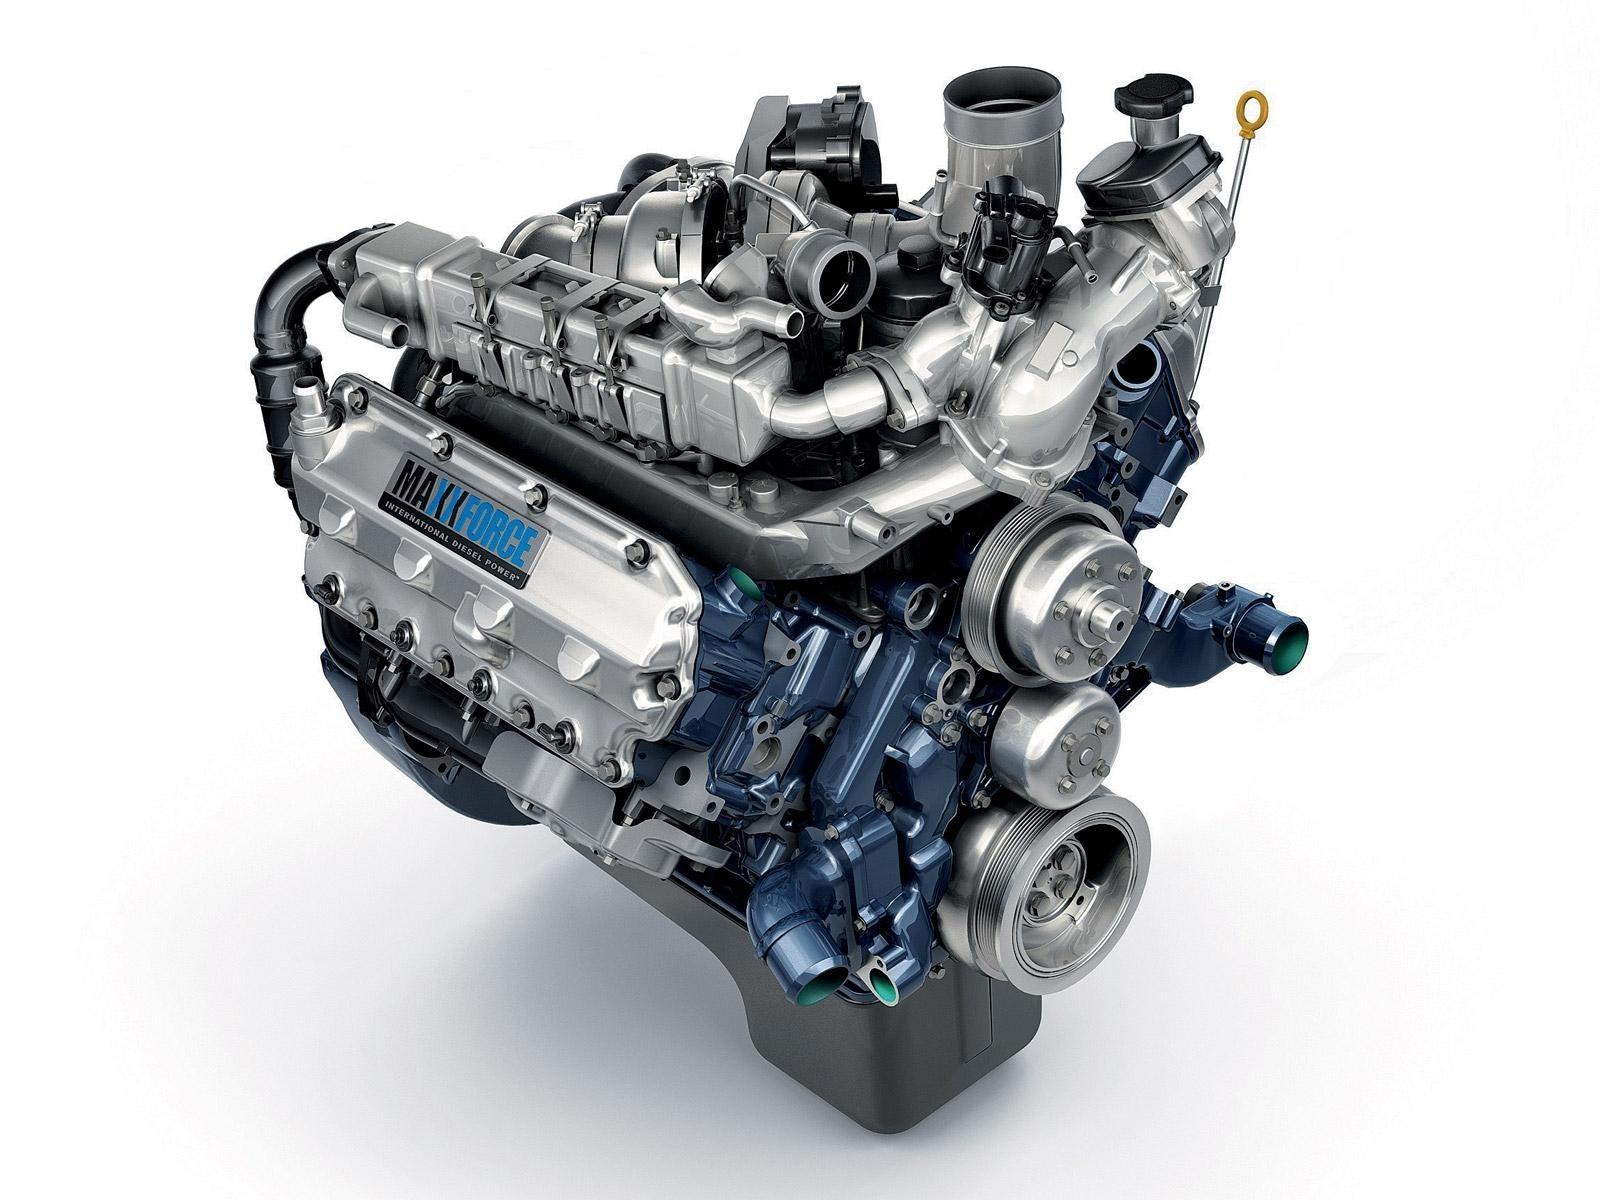 International Engine Breakdown Maxforce 13 Maxxforce 13 Engine Diagram Of International Engine Breakdown Maxforce 13